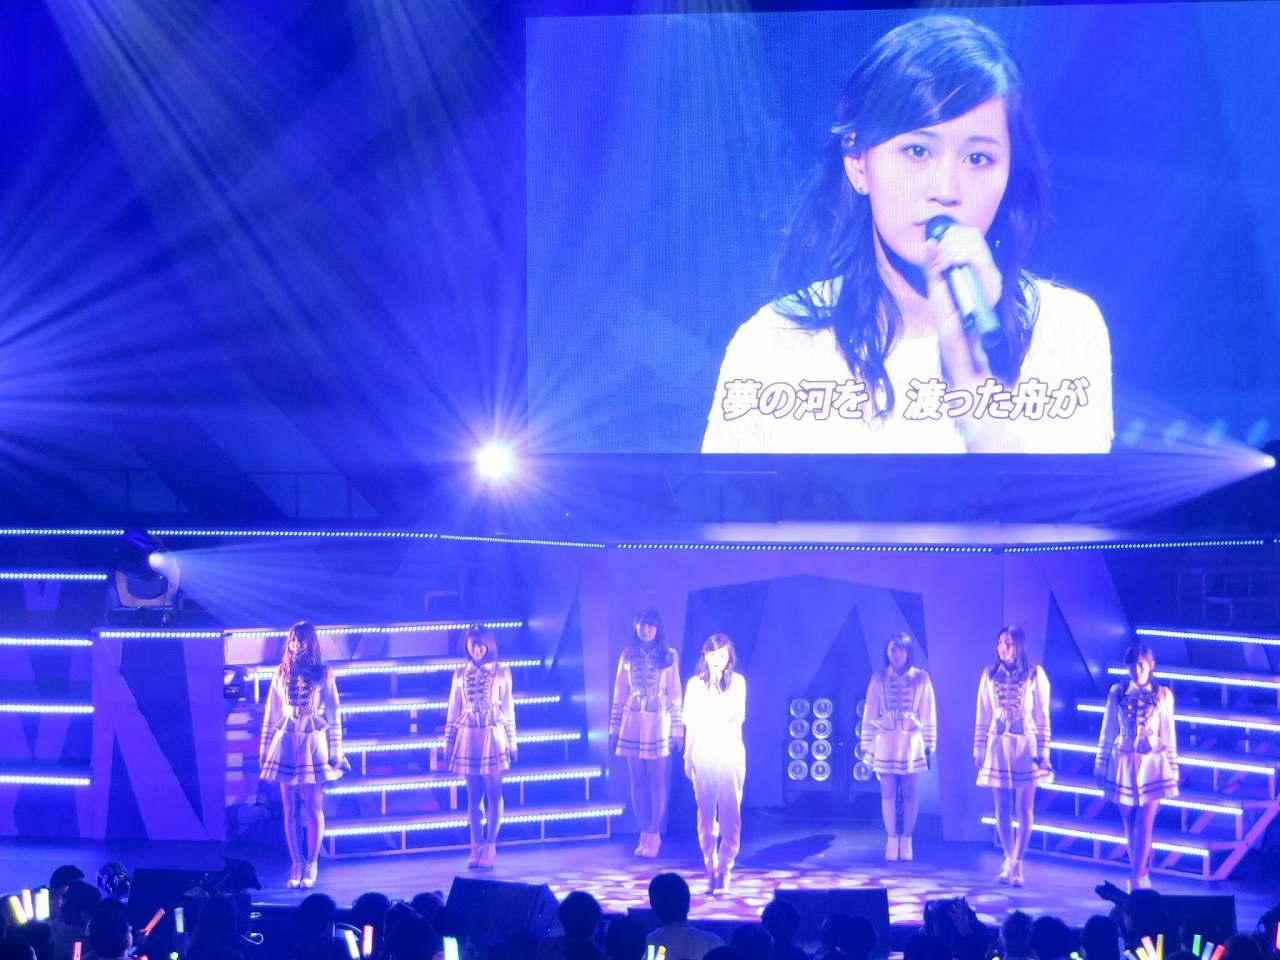 AKB48リクエストアワーにサプライズで復帰した前田敦子